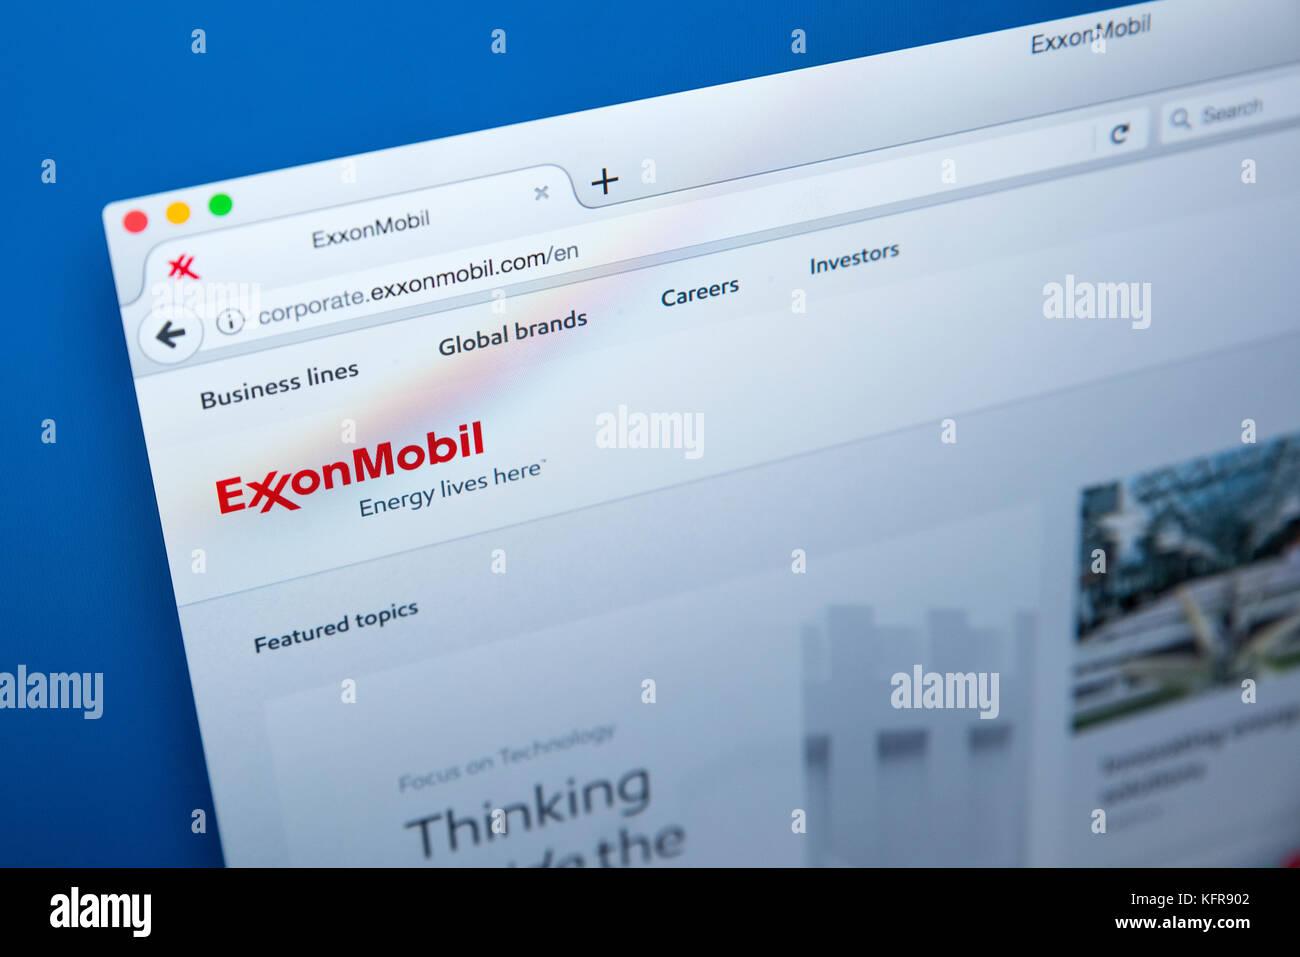 Exxon mobil corporation stock photos exxon mobil corporation stock london uk october 26th 2017 the homepage of the official website for exxonmobil buycottarizona Gallery